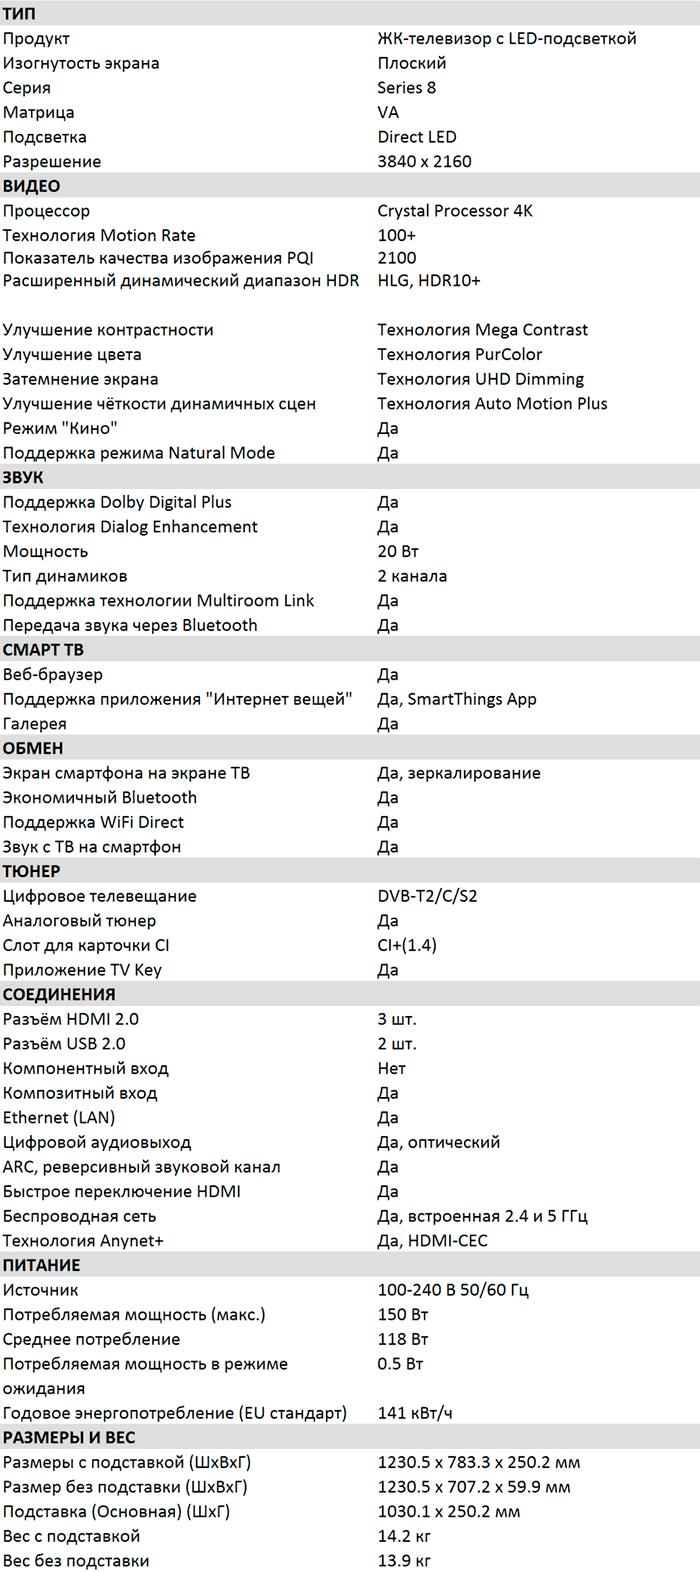 Характеристики Samsung TU8000